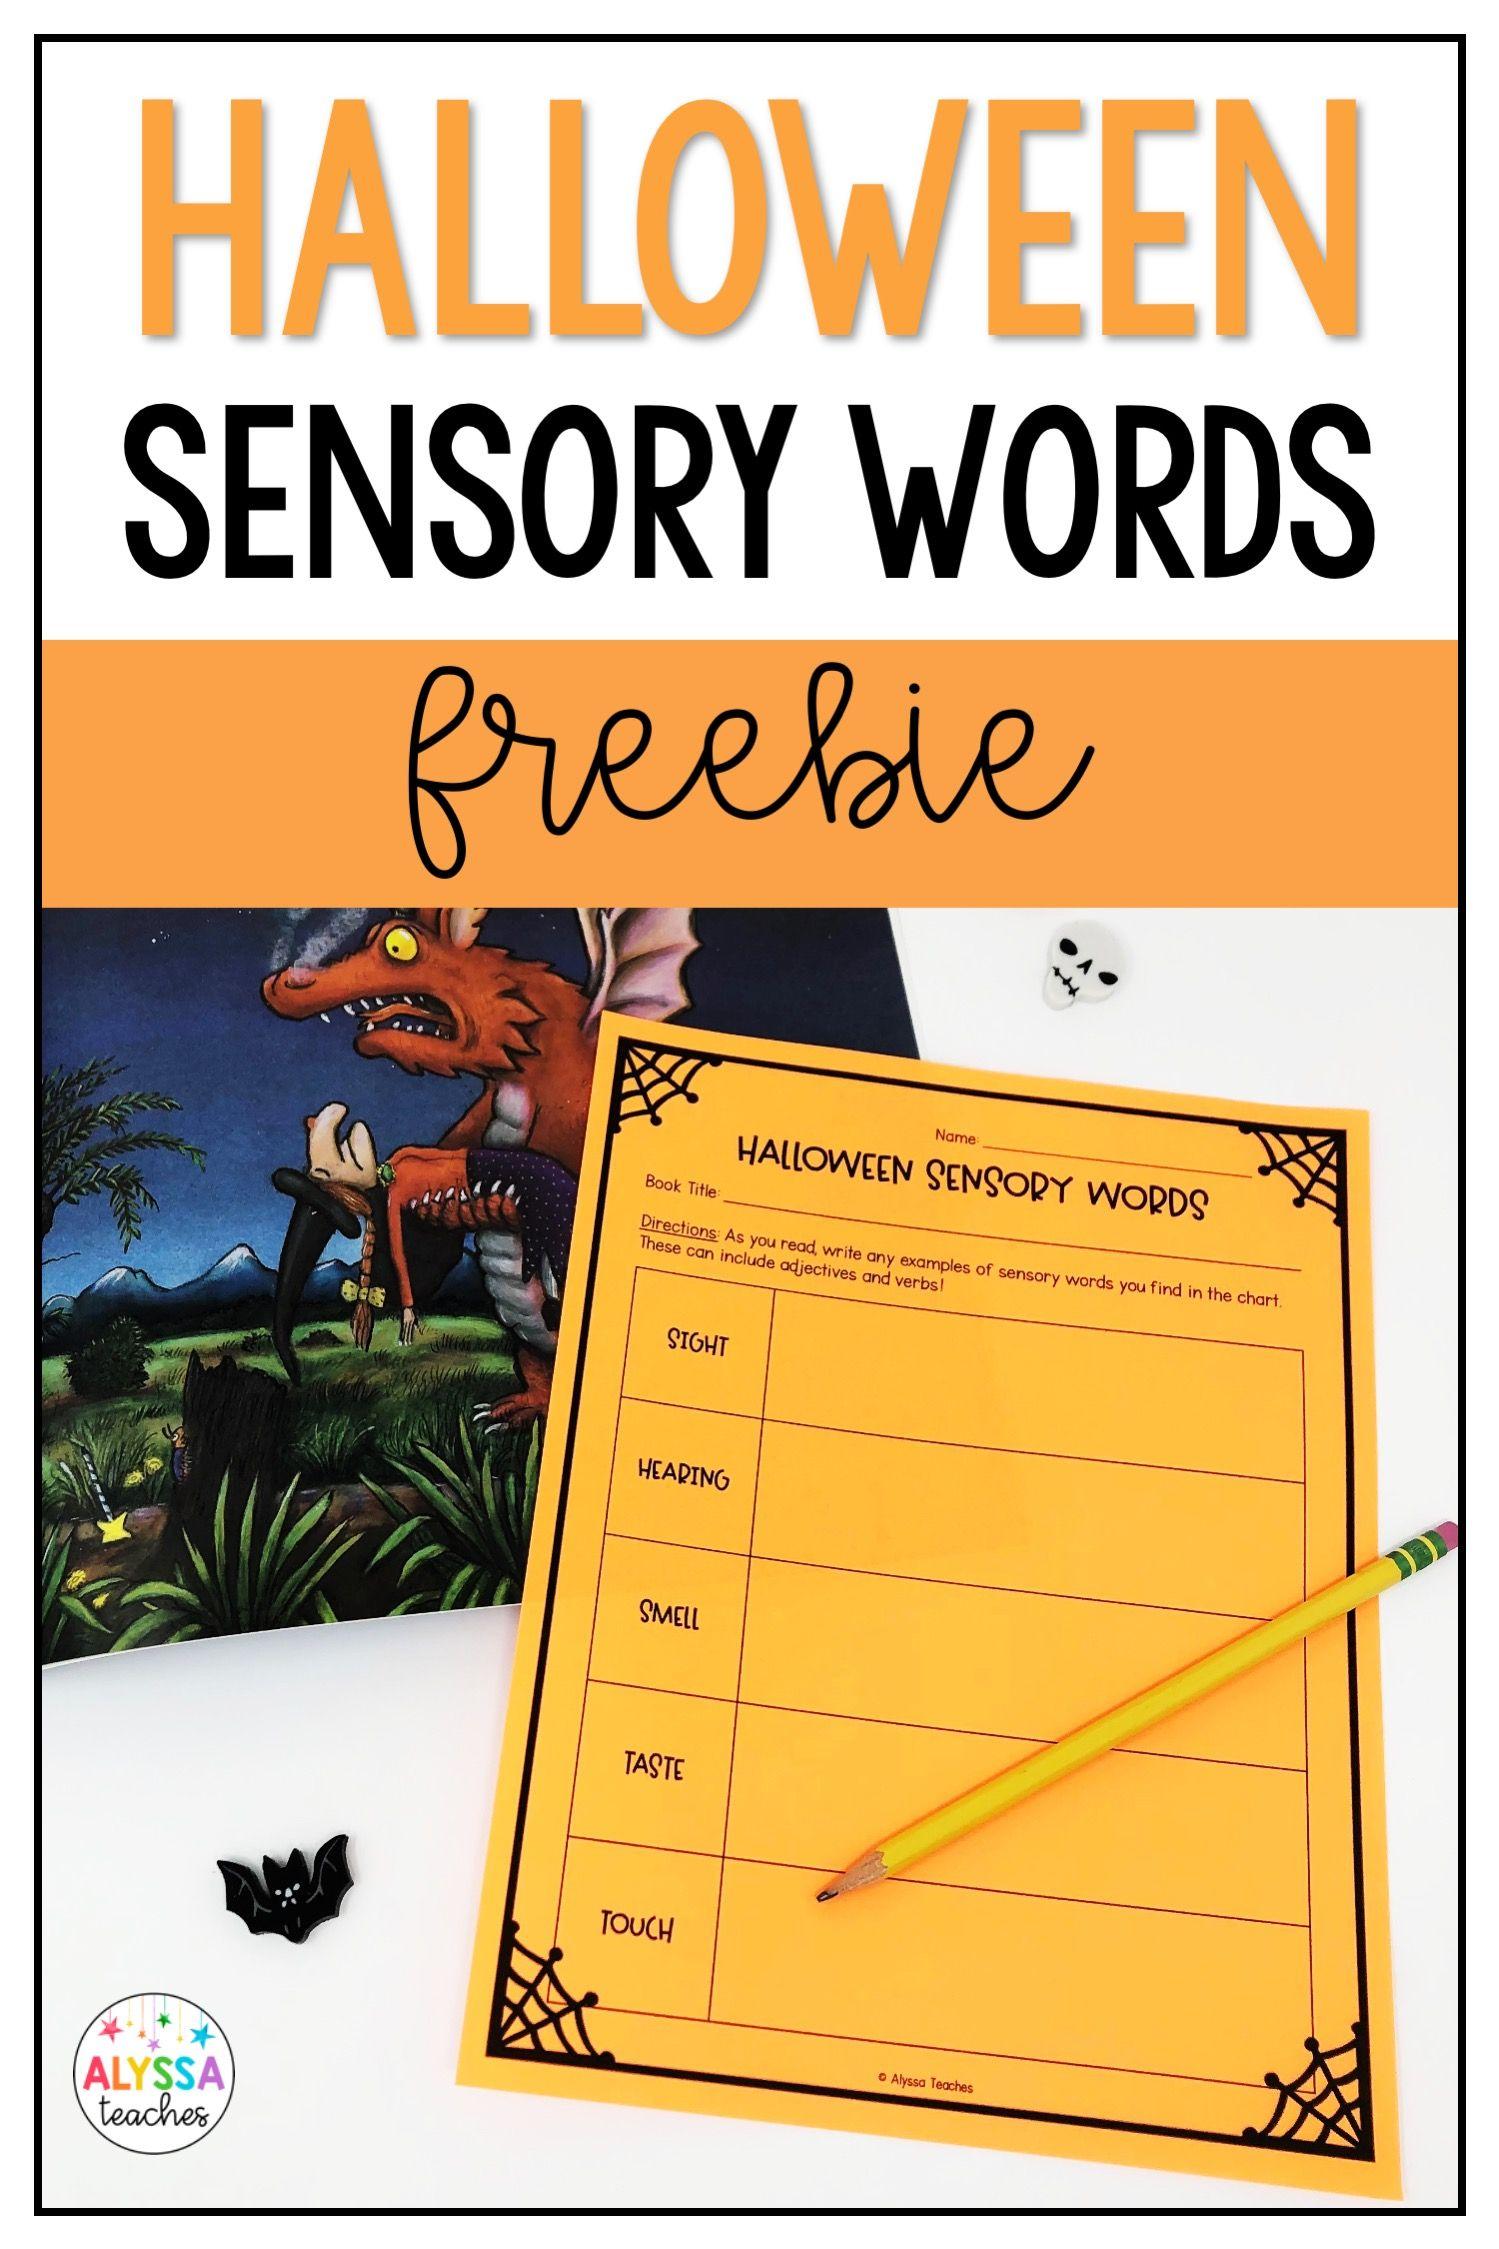 Halloween Sensory Words Free Worksheet In 2020 Sensory Words Teaching Blogs Halloween Reading Activity [ 2249 x 1499 Pixel ]